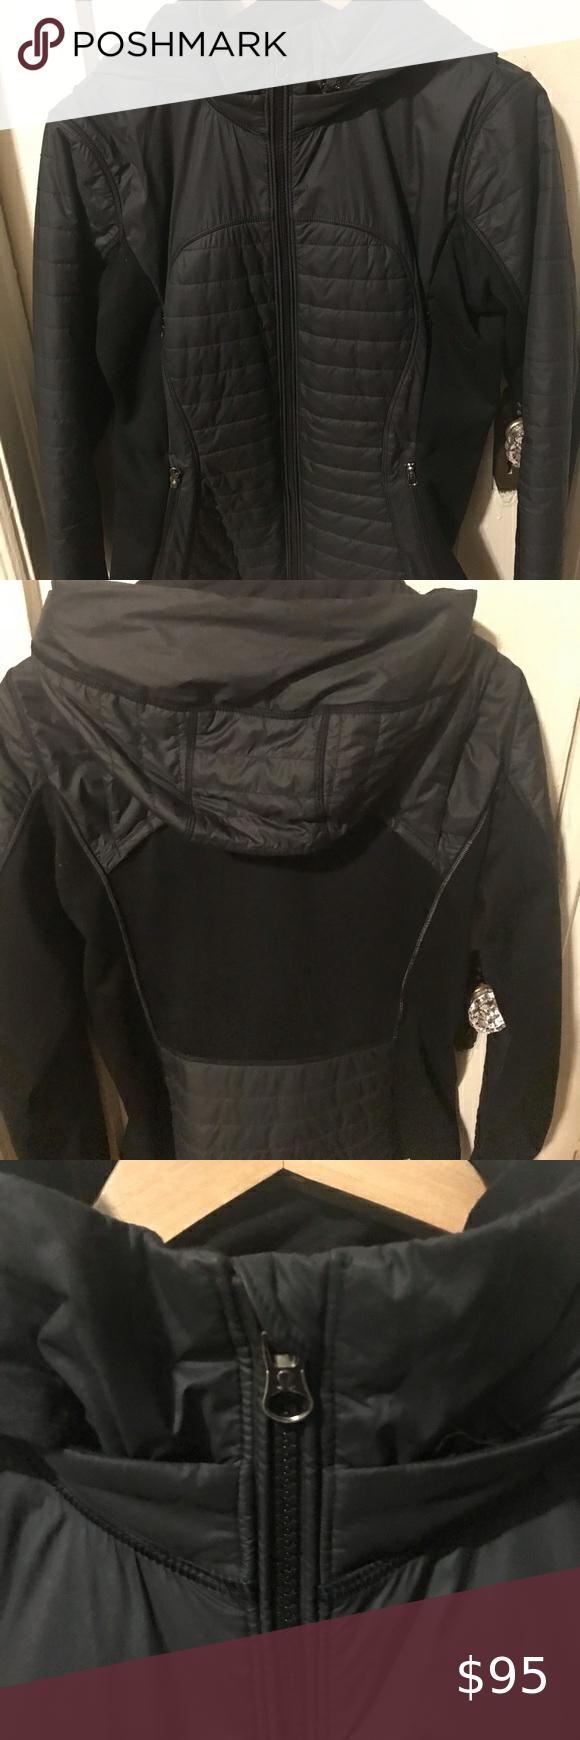 Lululemon Outerwear Jacket Outerwear Jackets Jackets Lululemon Jacket [ 1740 x 580 Pixel ]